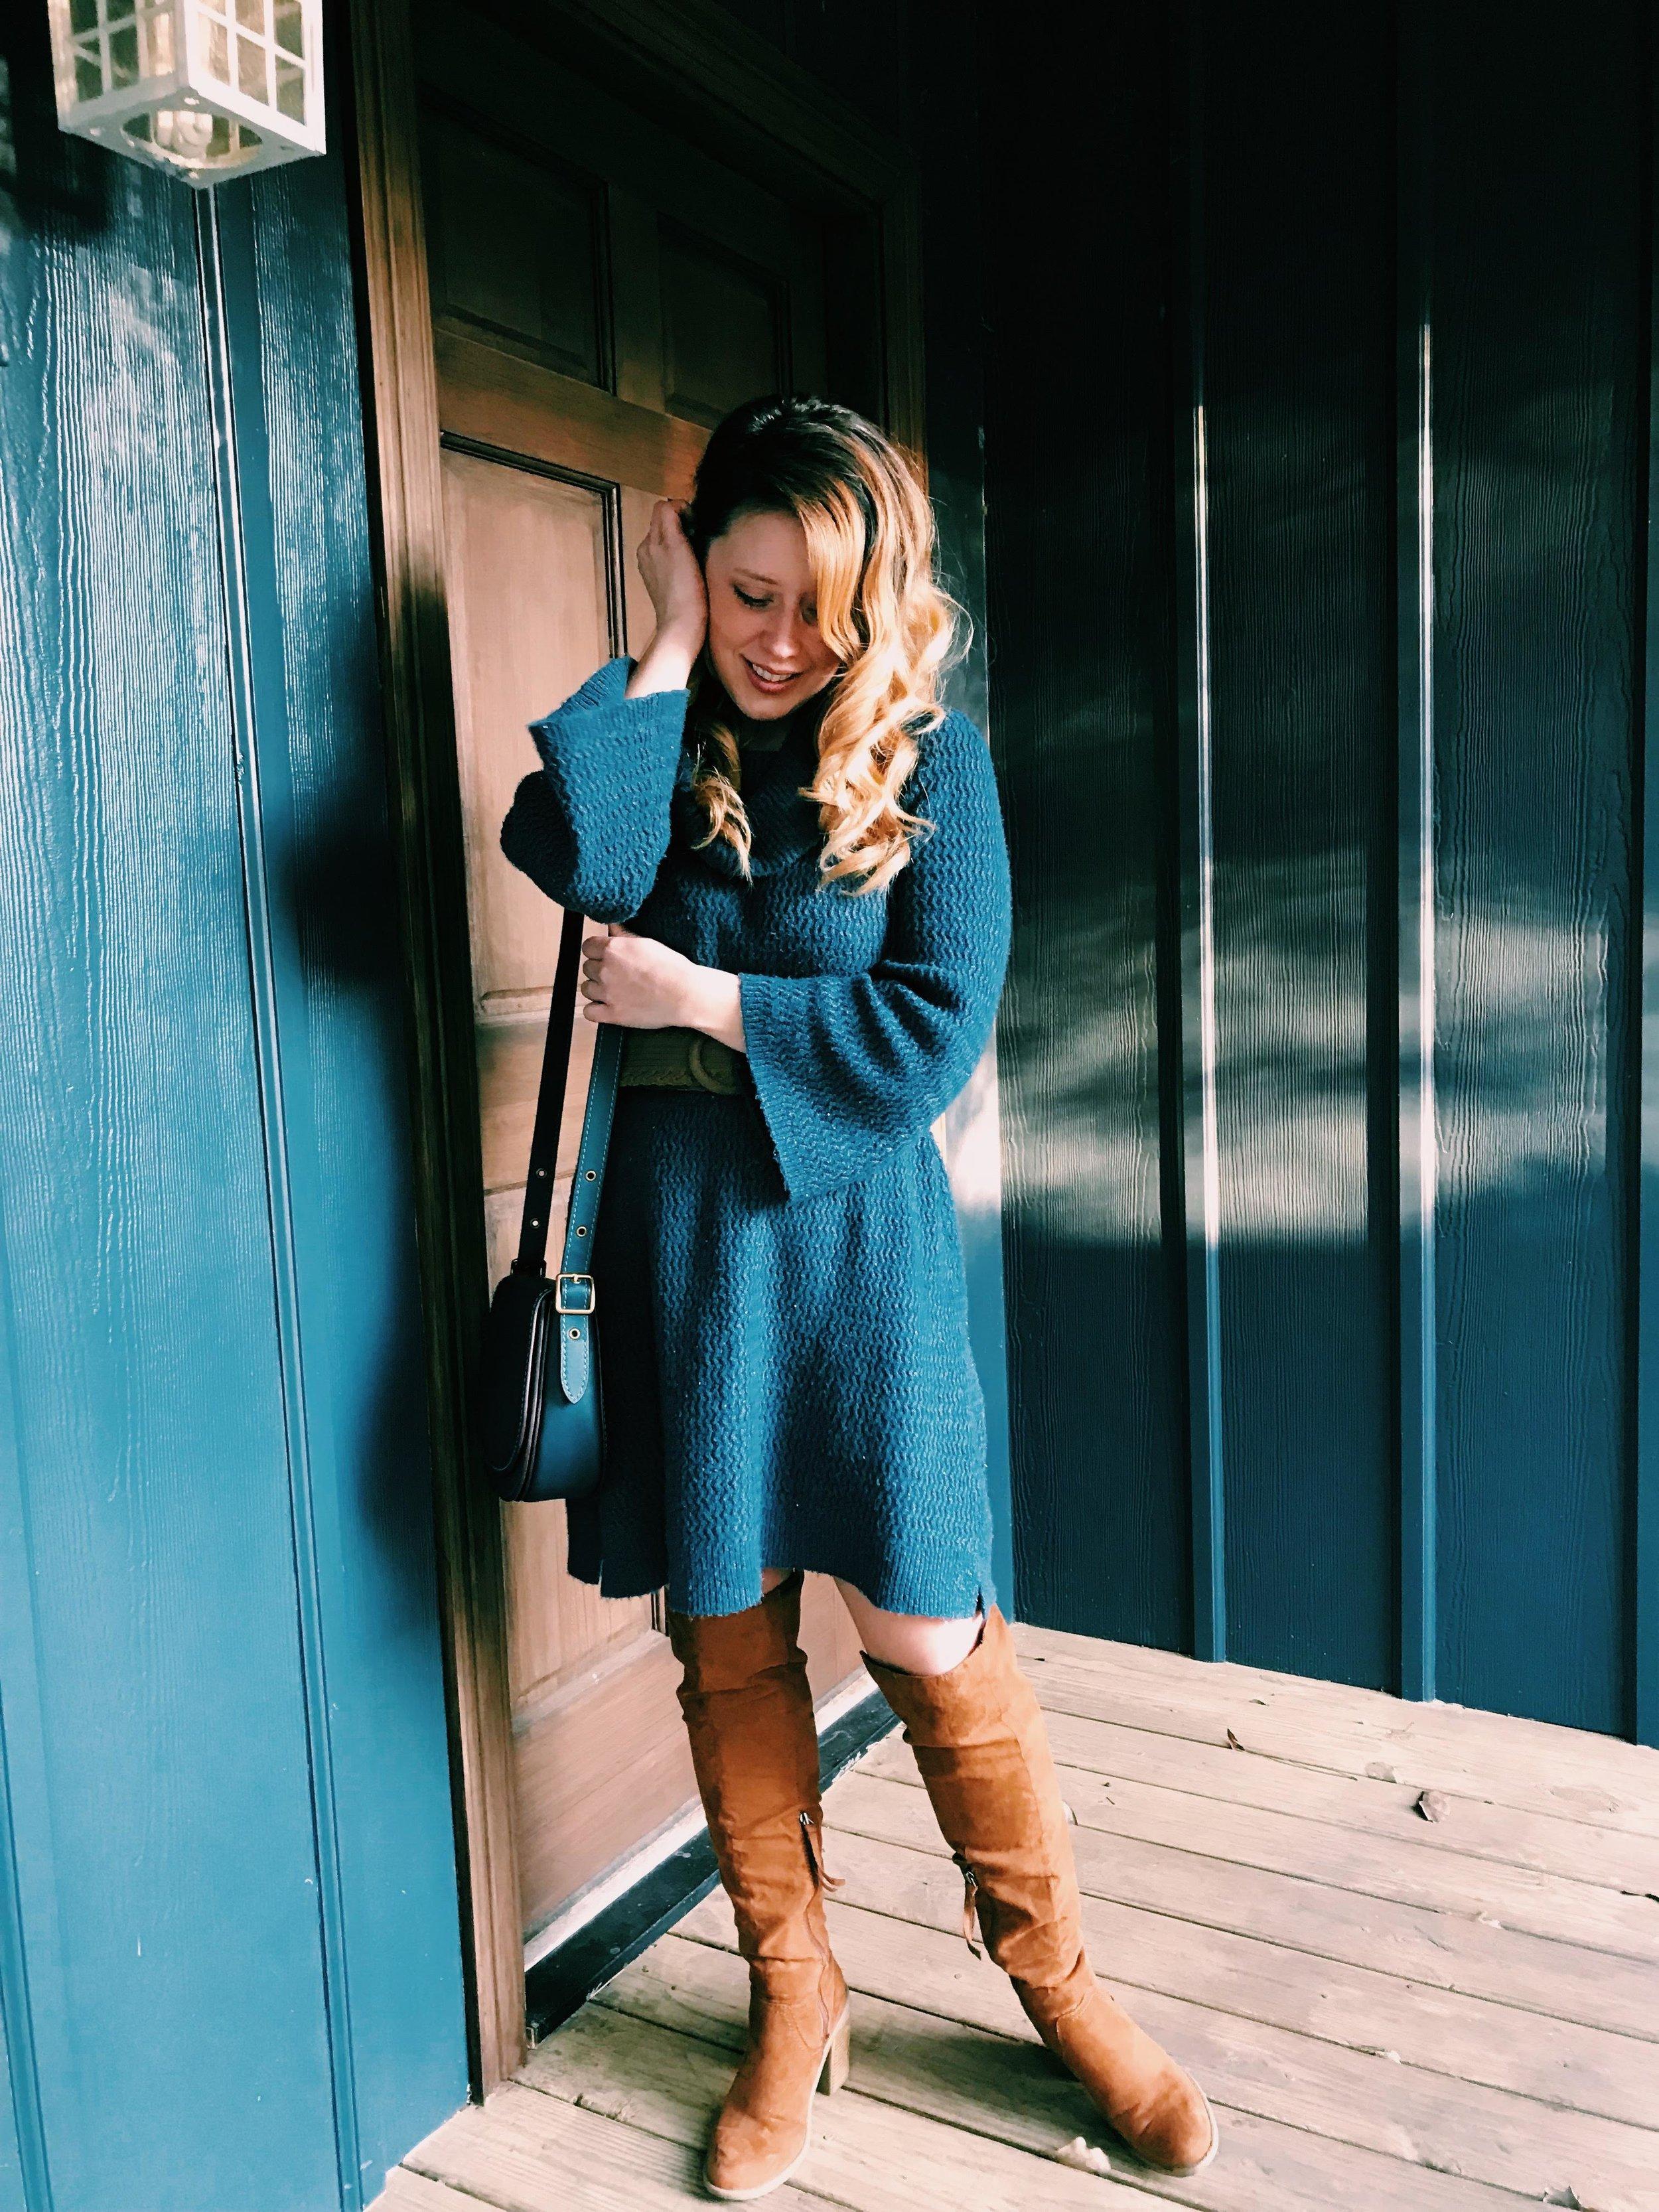 Three Heel Clicks - Styling a Sweater Dress from LOFT (3).jpg